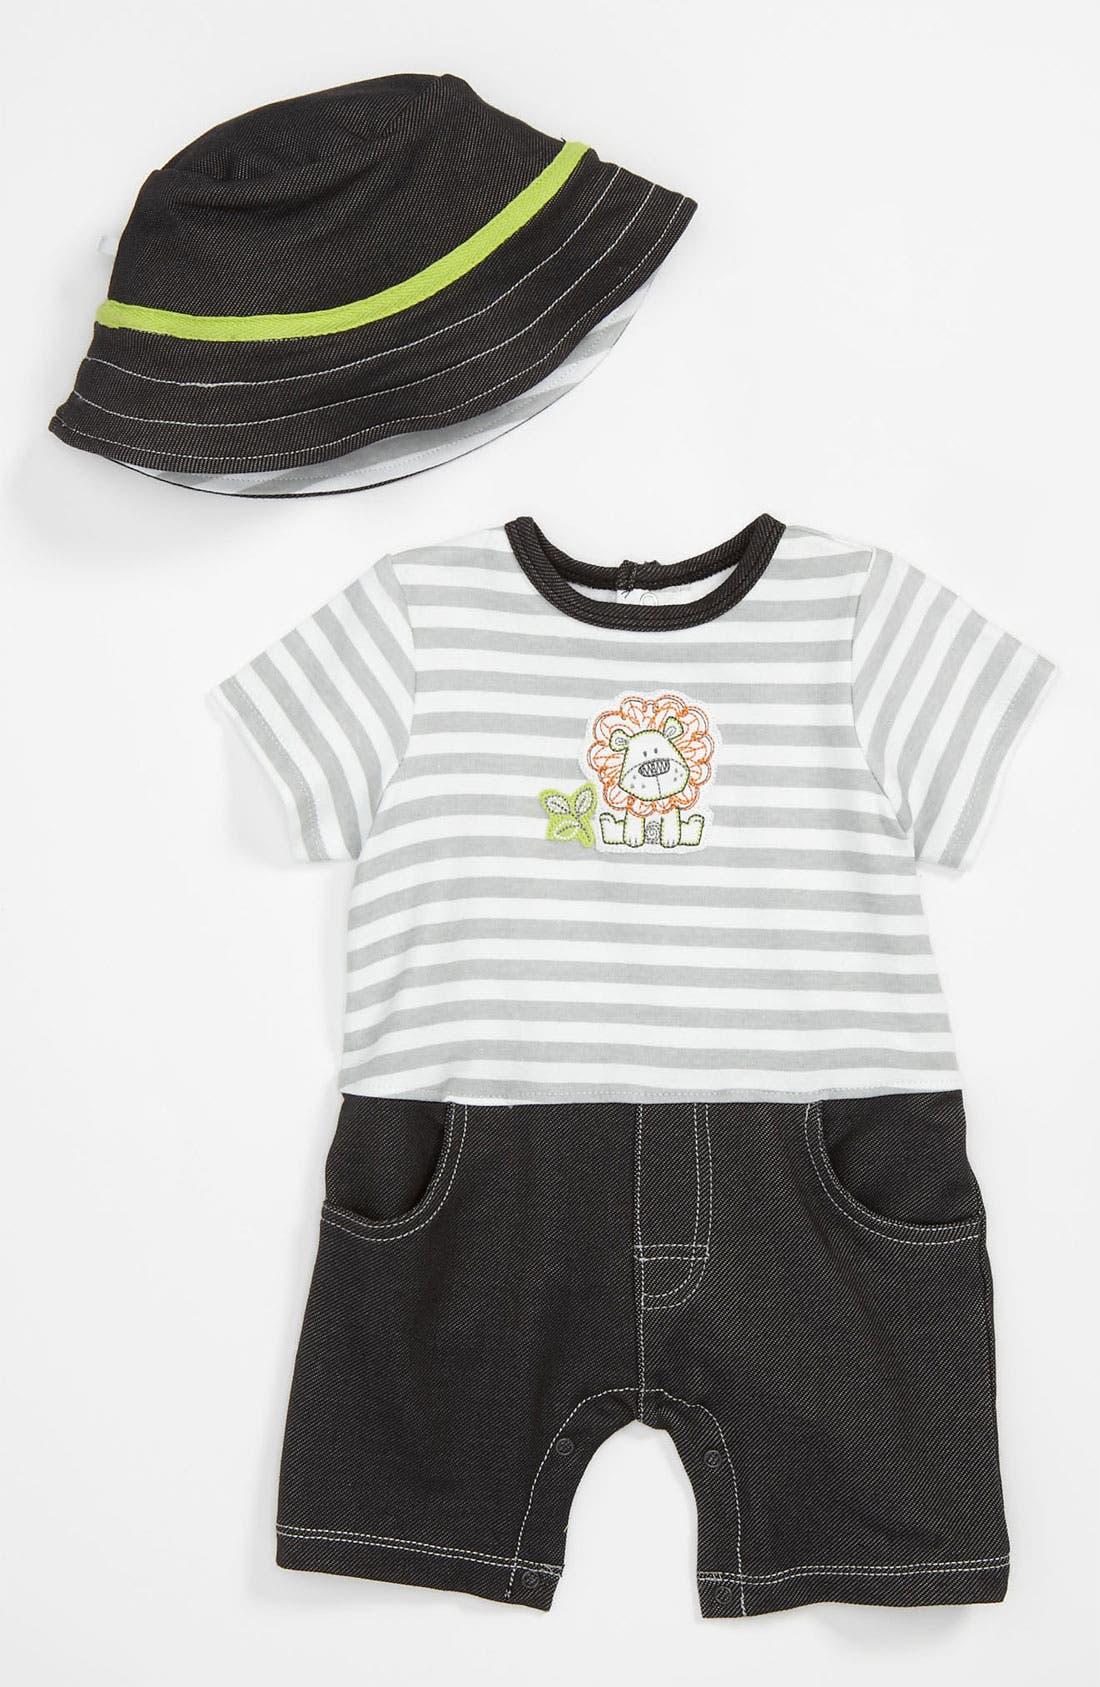 Alternate Image 1 Selected - Little Me 'Safari Club' Romper & Hat (Infant)